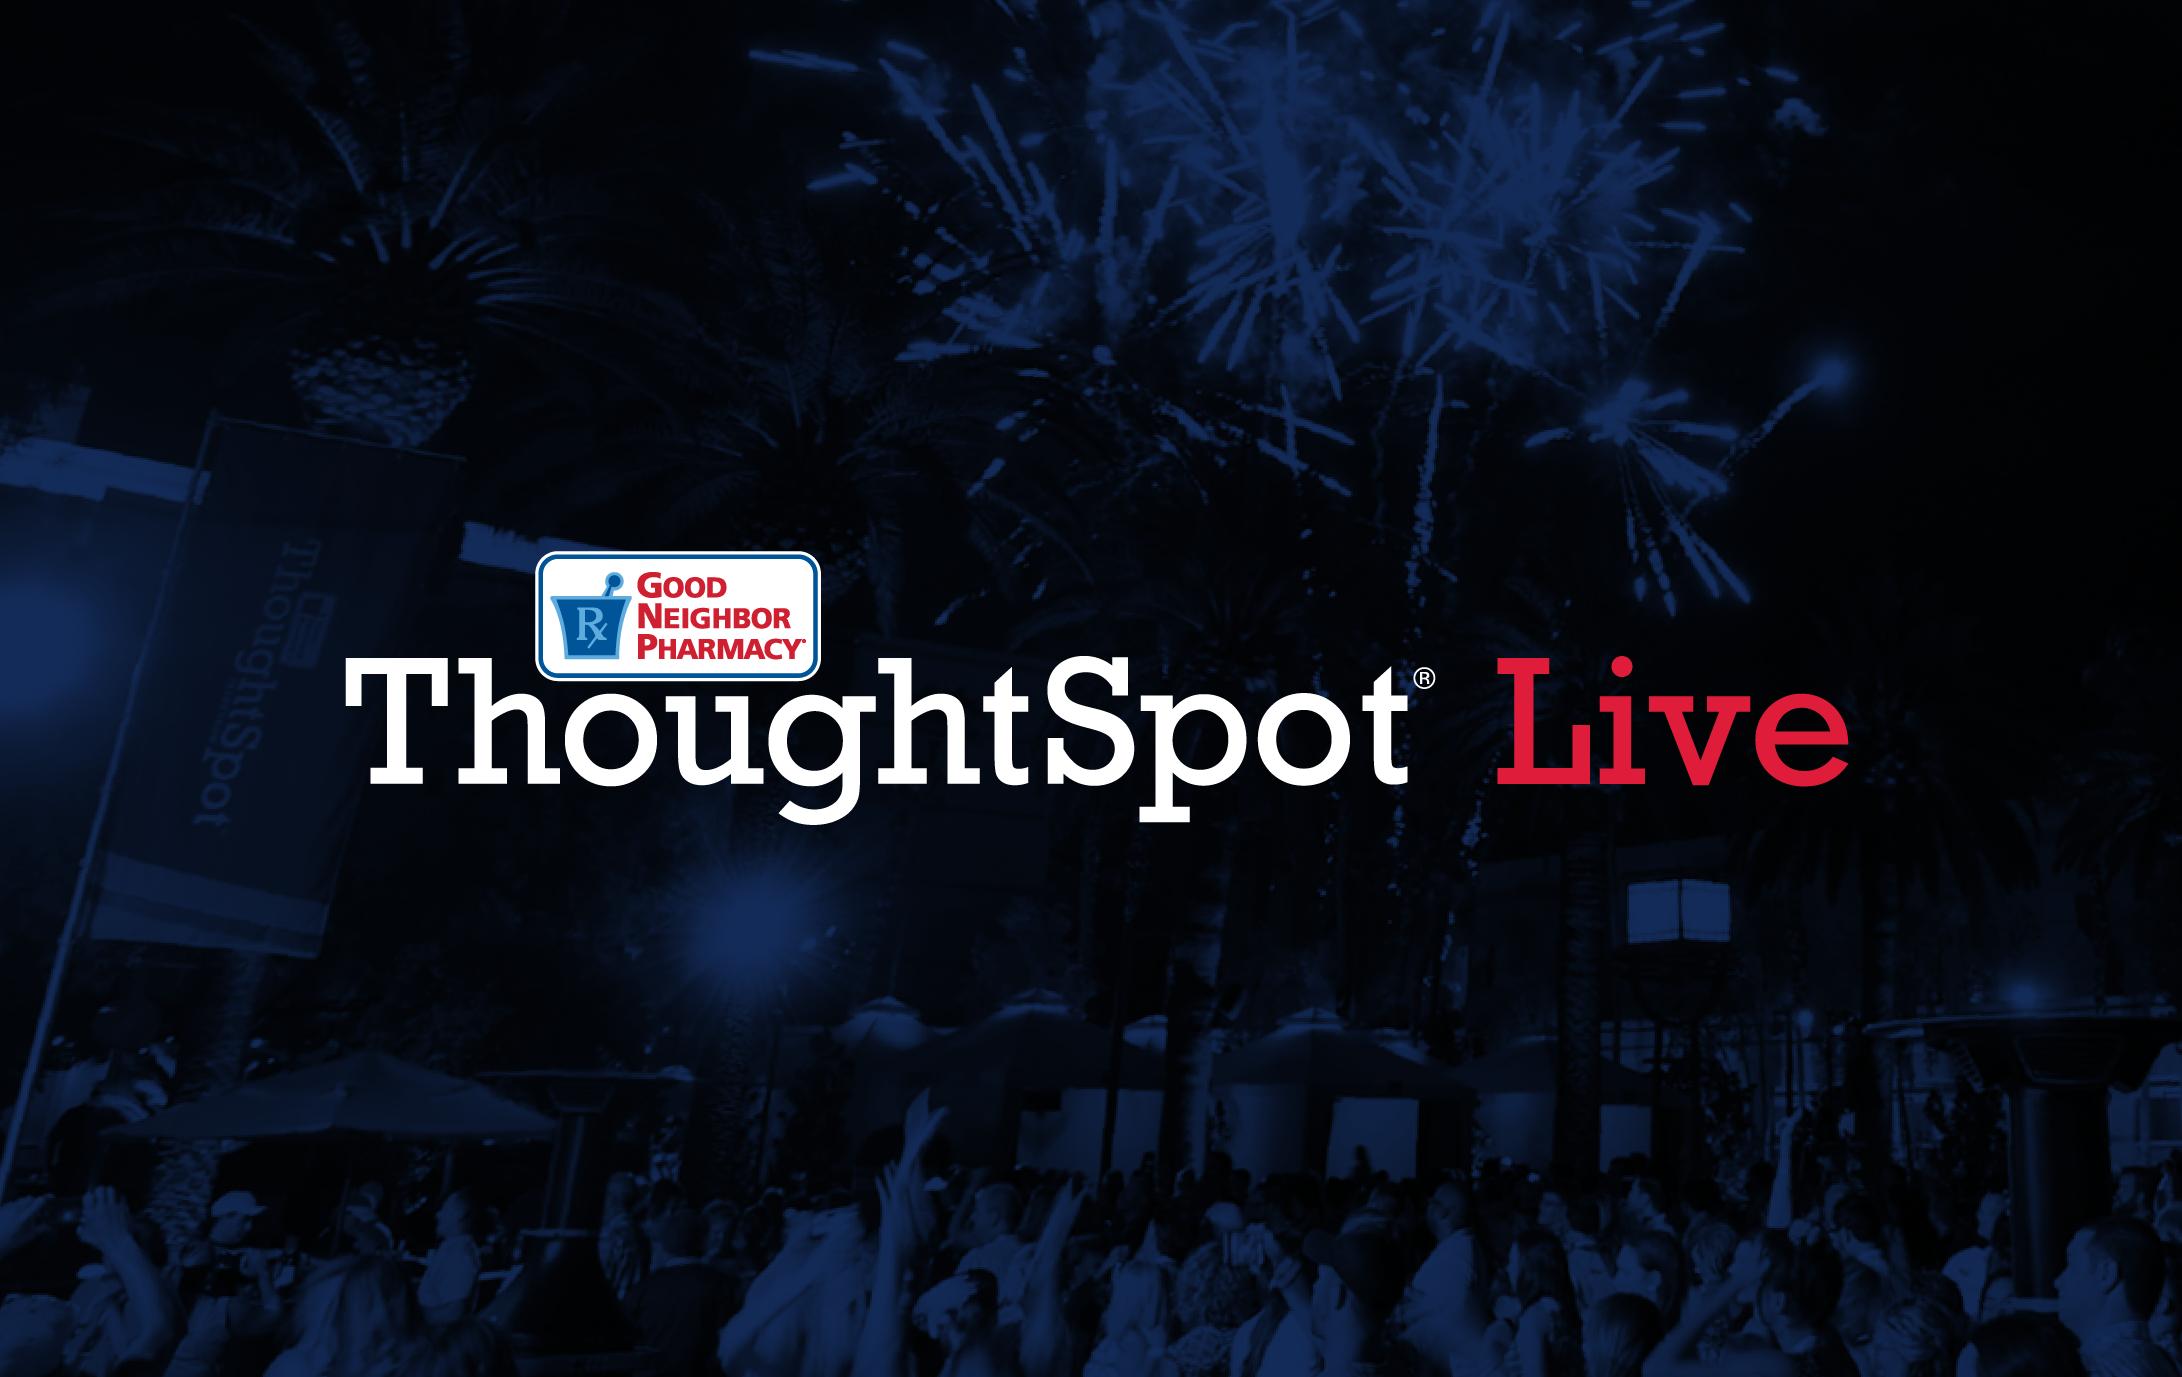 AmerisourceBergen ThoughtSpot Live Portfolio Link